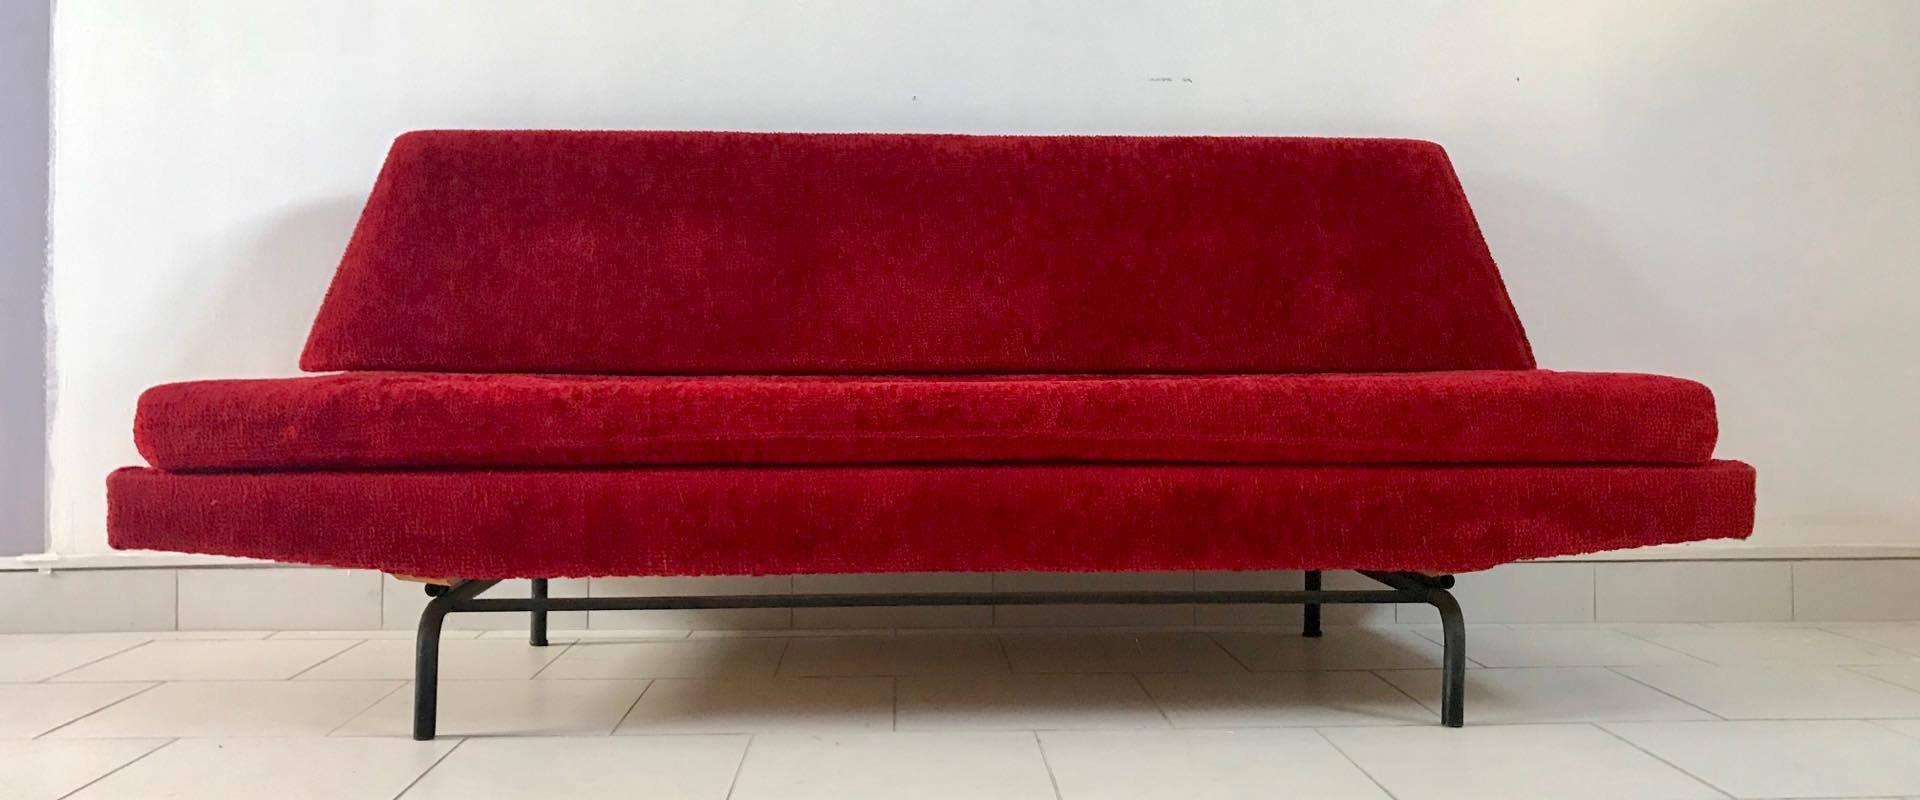 drei sitzer sofa 1970er bei pamono kaufen. Black Bedroom Furniture Sets. Home Design Ideas